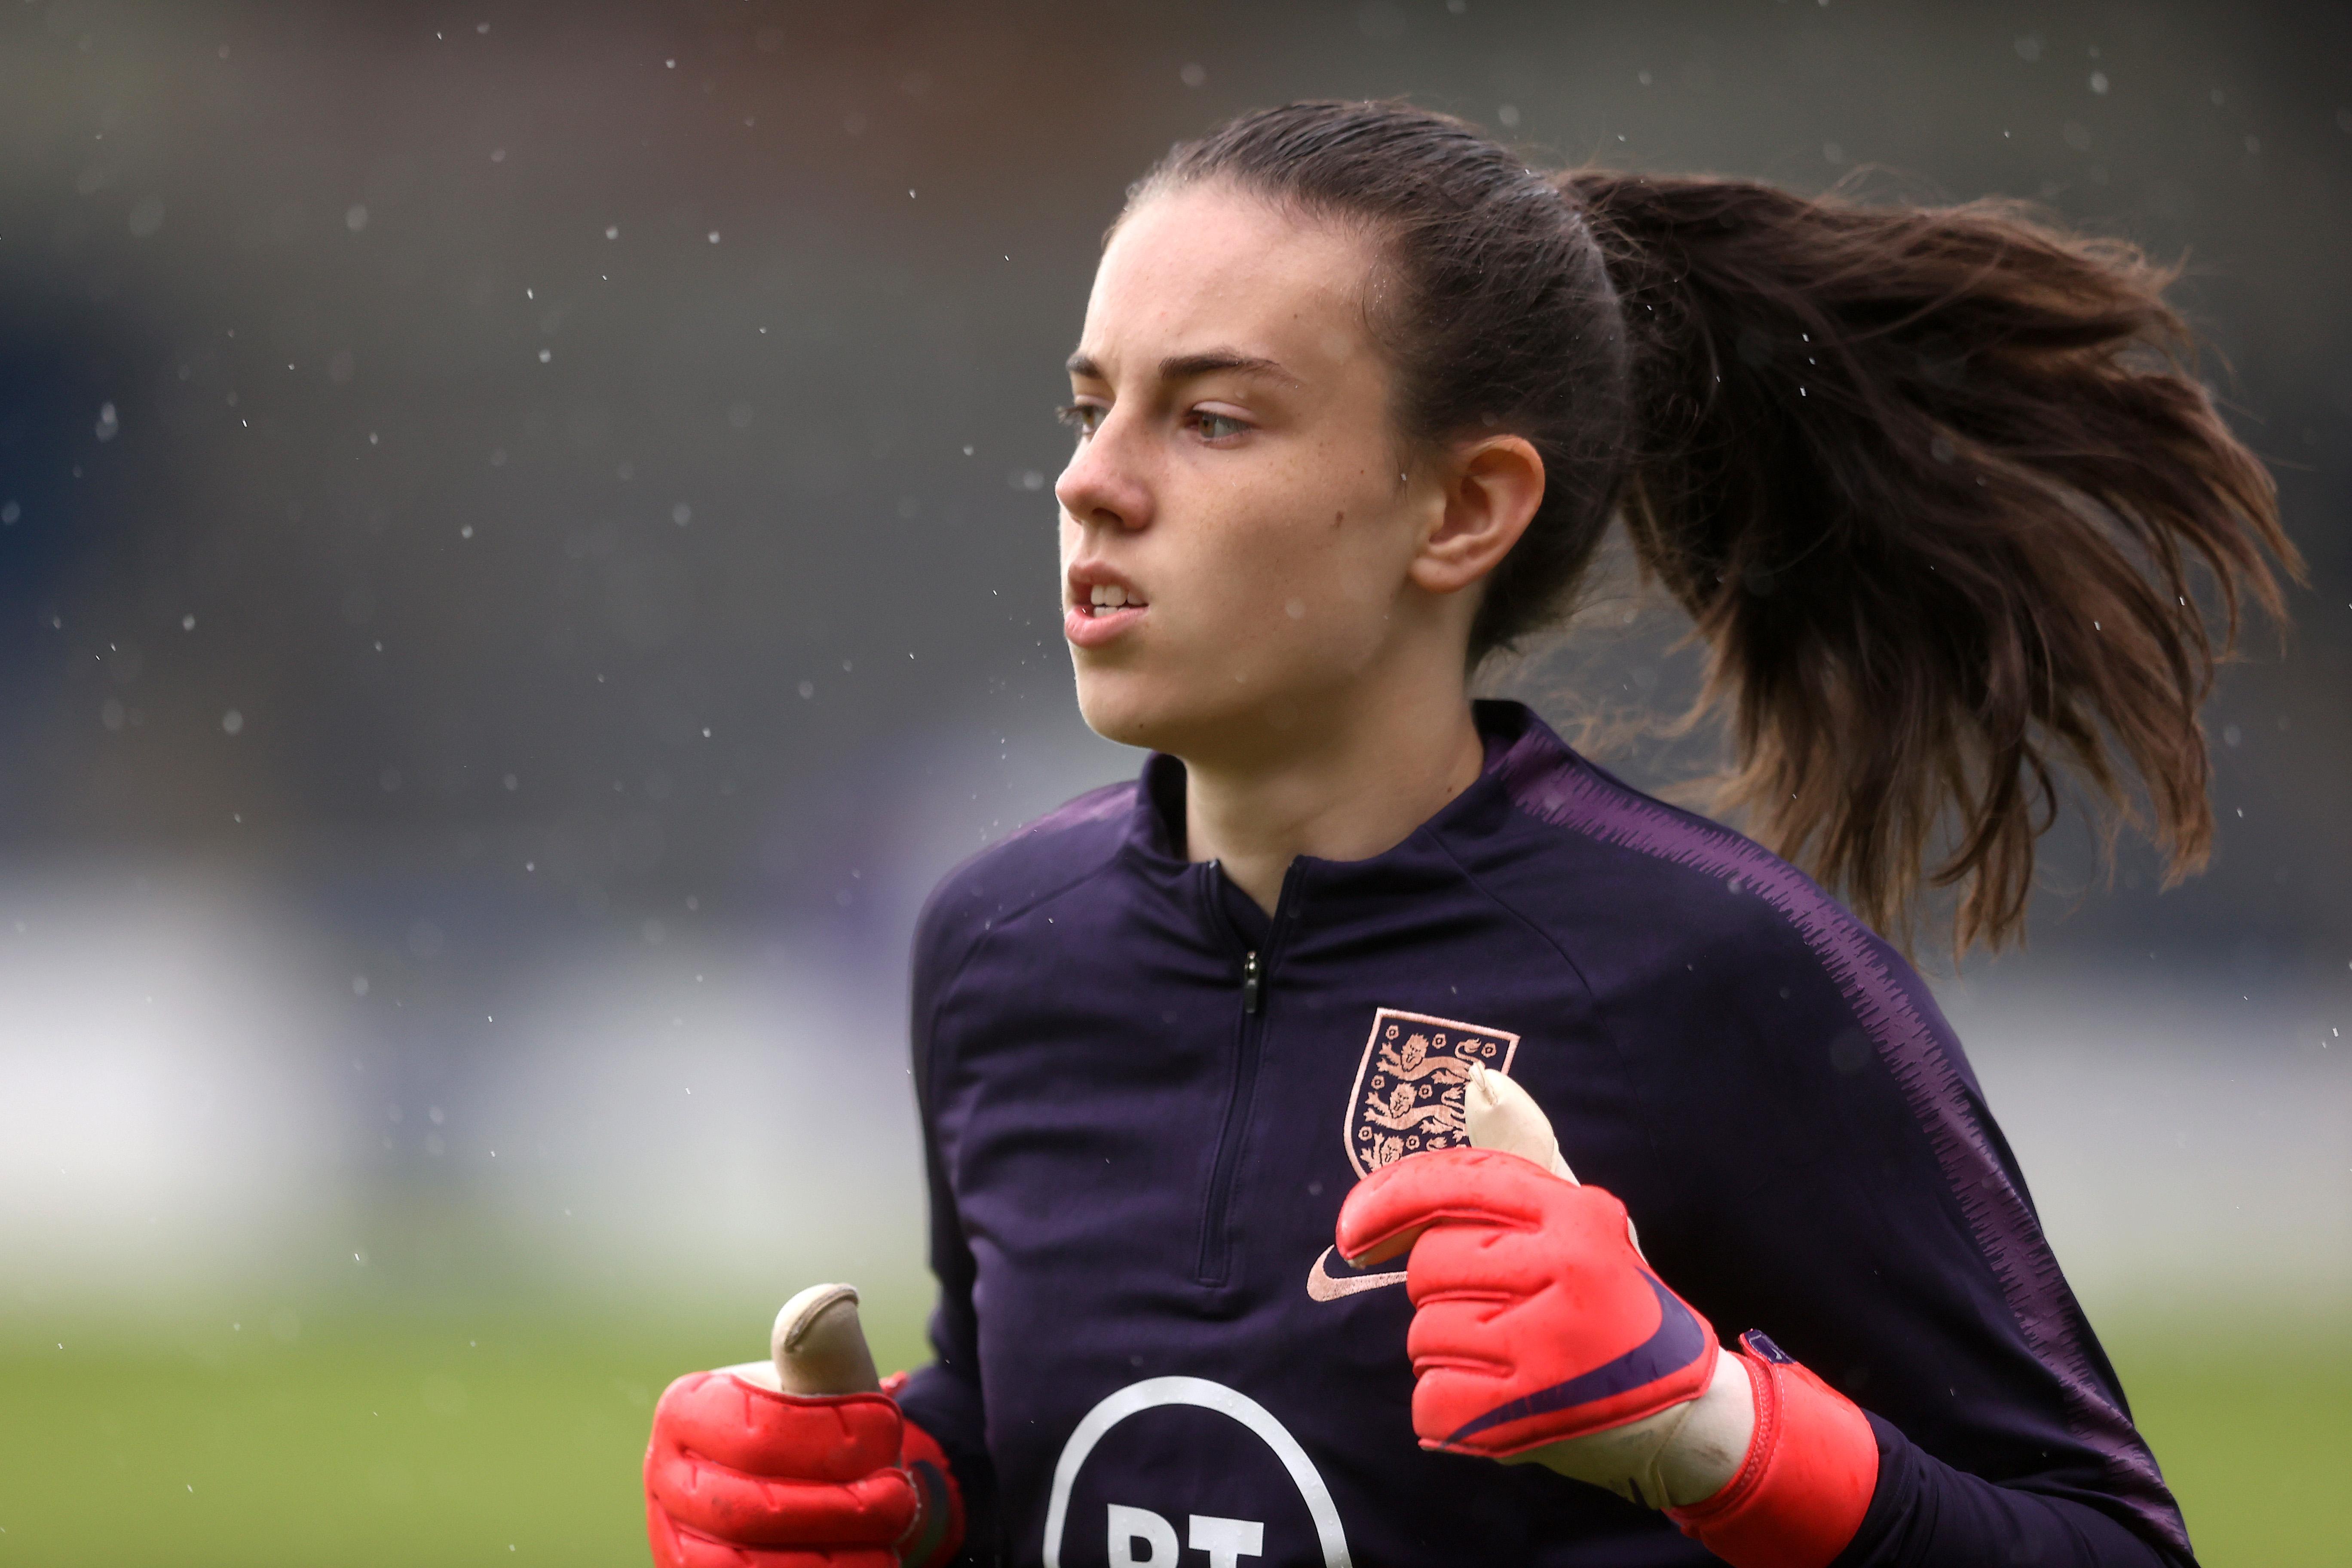 England WU19 V Czech Republic: Women's U19 Friendly